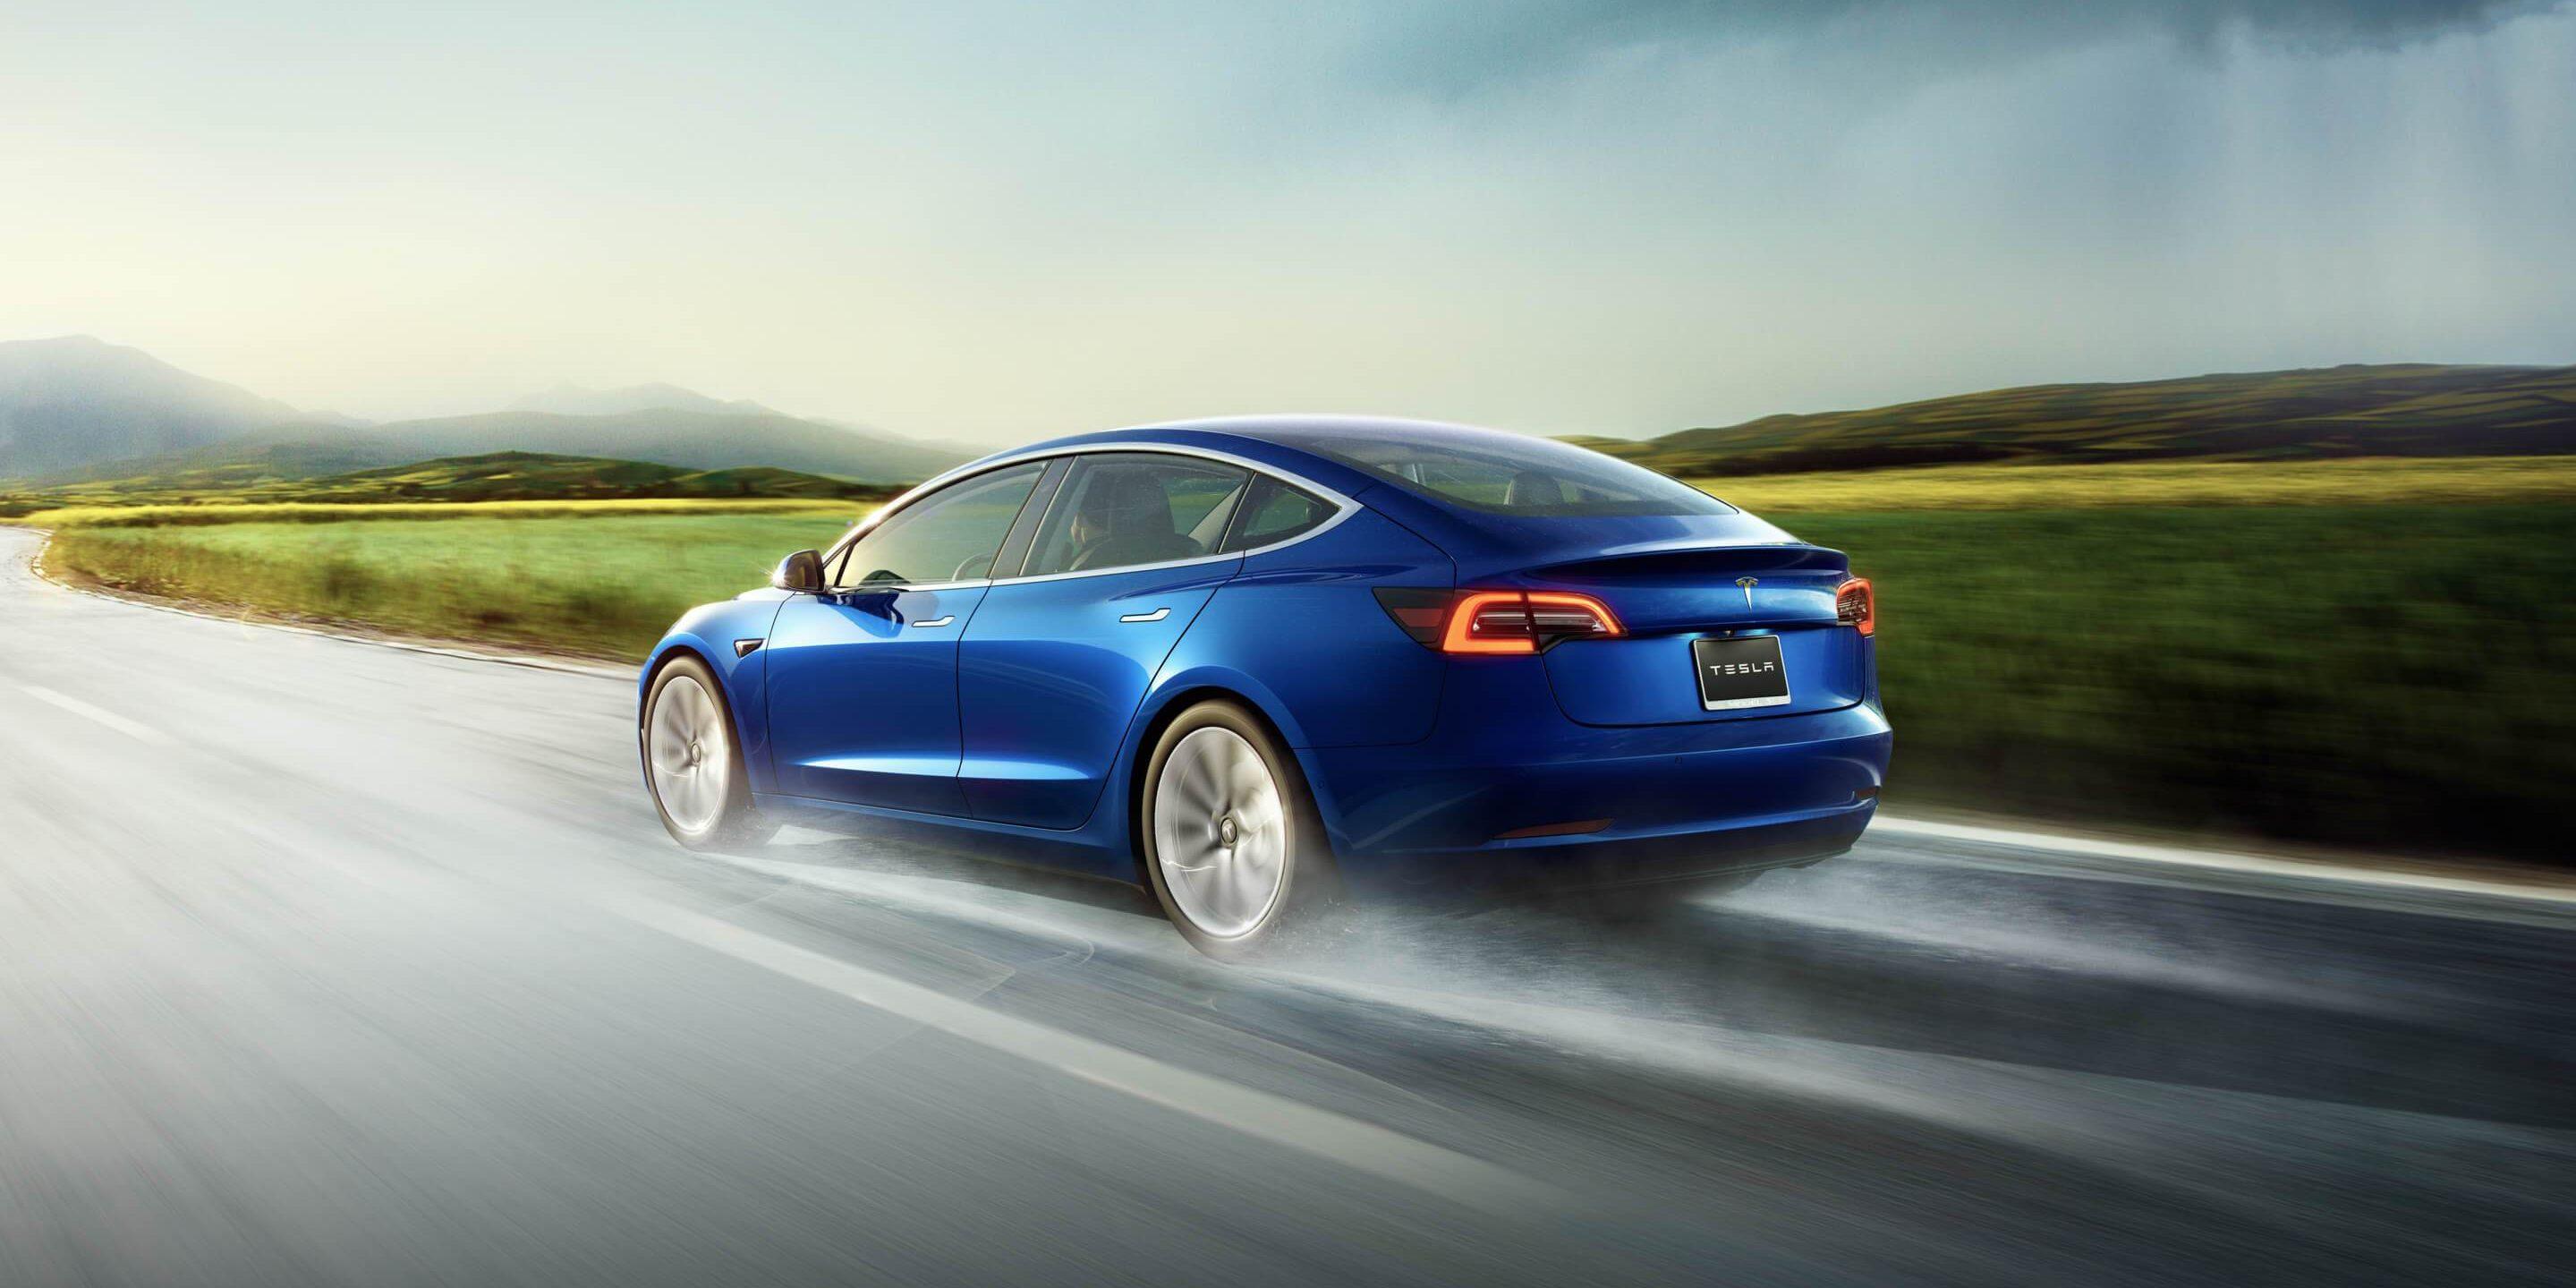 Tesla is preparing to offer Model 3 leasing to boost demand - Electrek